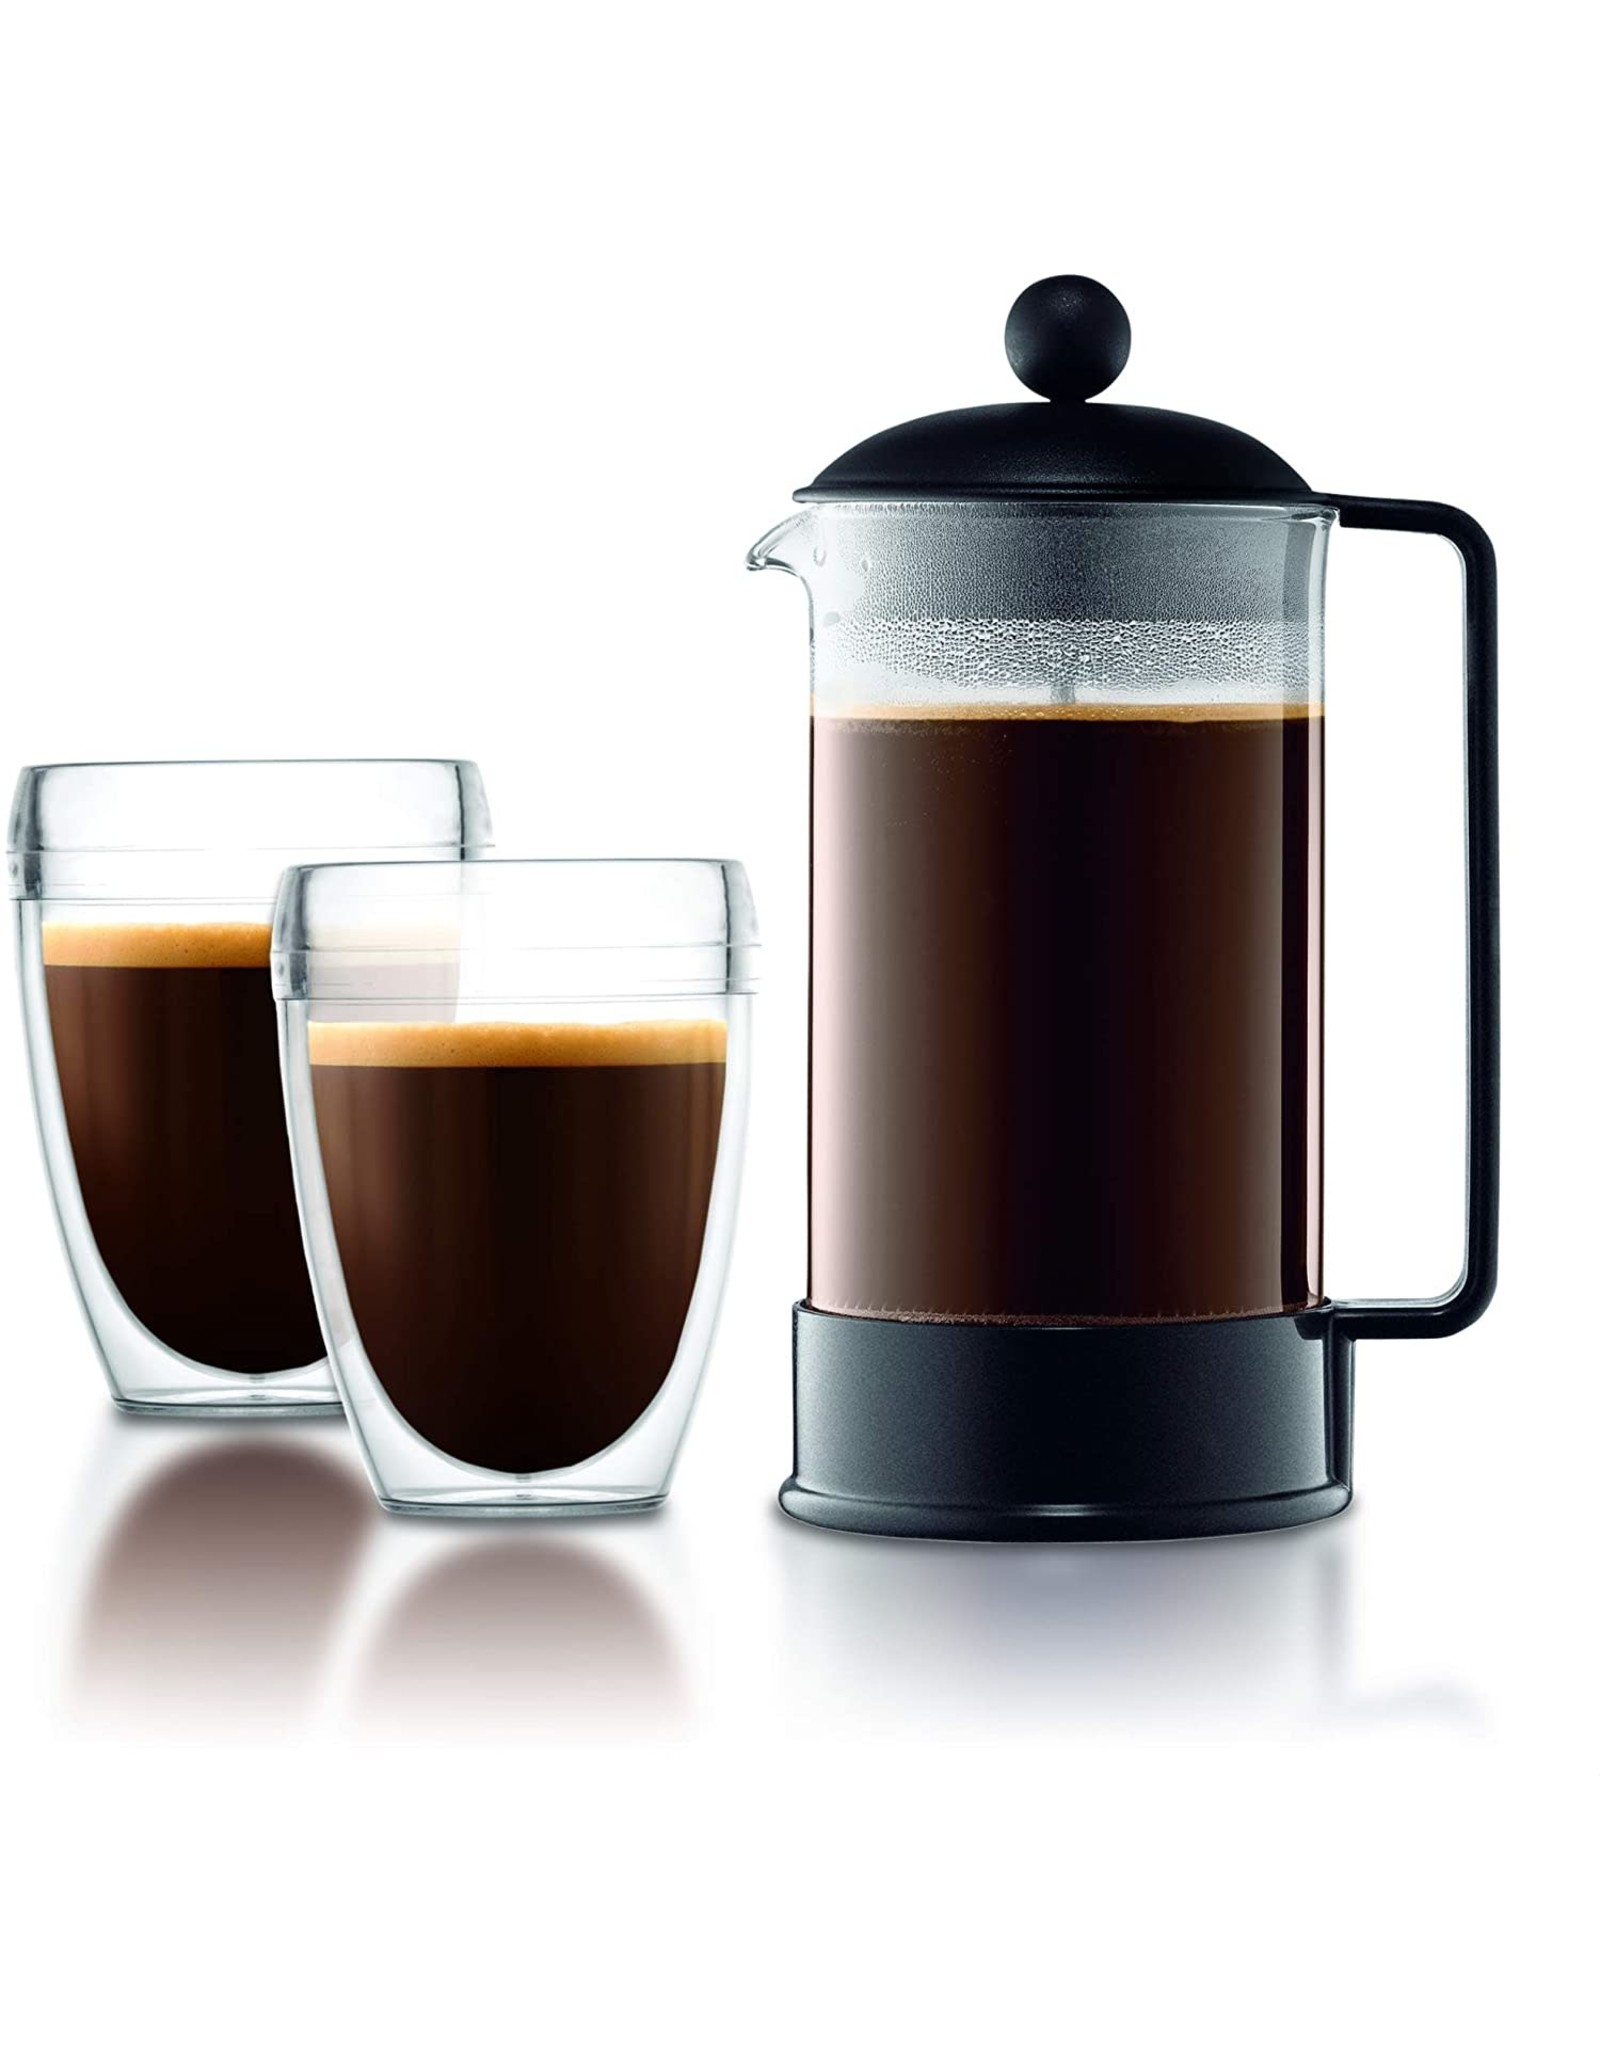 Bodum BRAZIL French press 3 cup 350mL